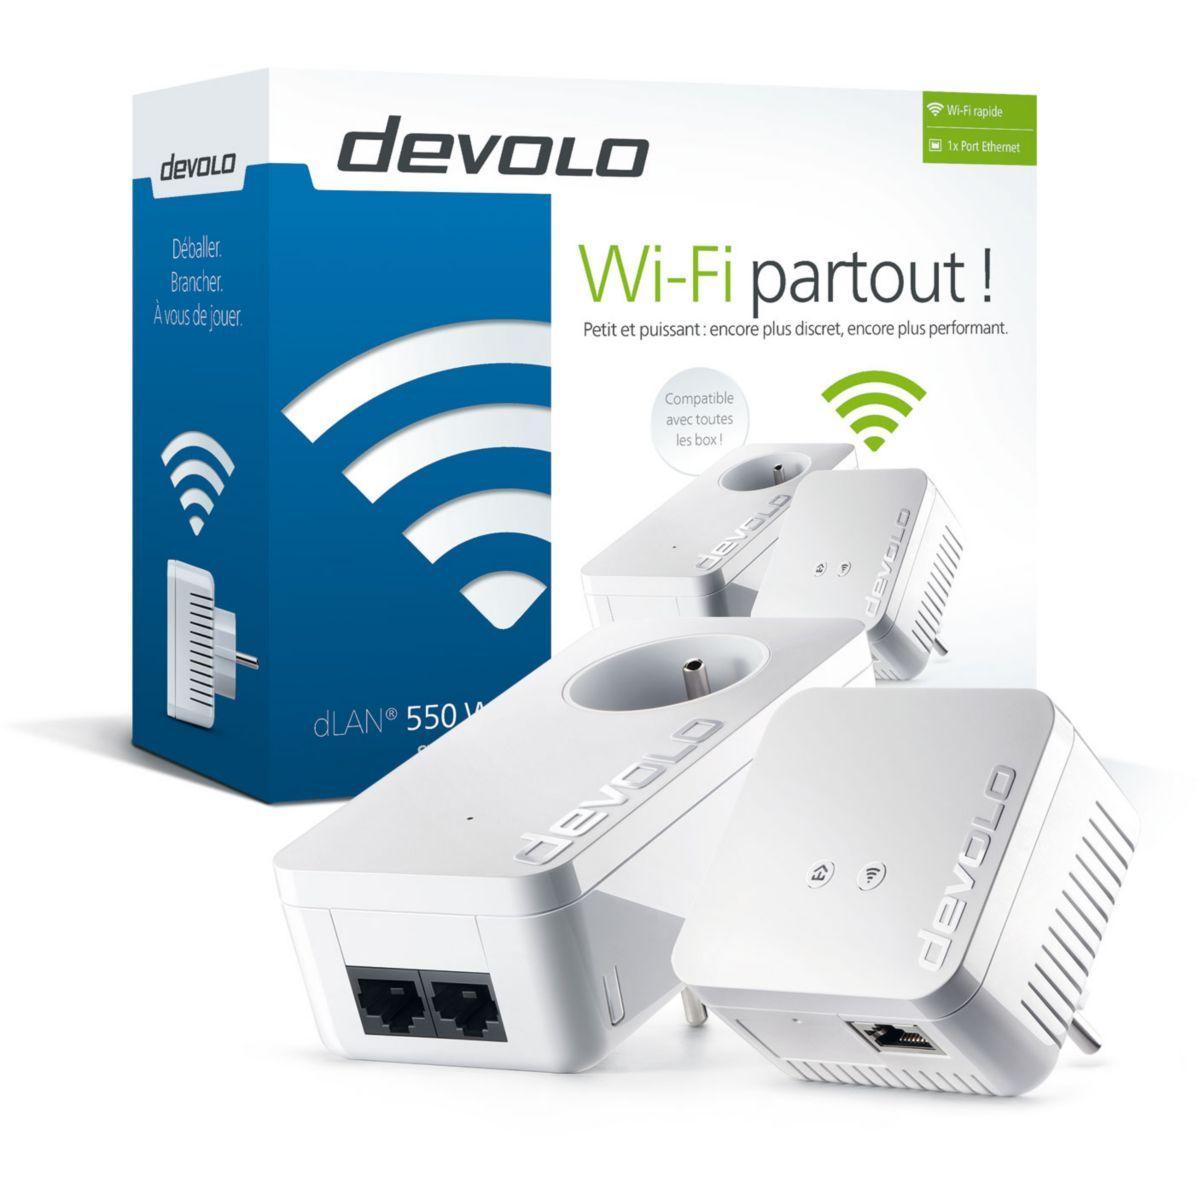 Cpl Tv Hd Sfr Cpl 200 Mbps Ou 500 Adaptateur Cpl Devolo Dlan 500 Wifi Network Kit Mil Ordinateur Portable Gamer Ordinateur Portable Asus Pc Portable Asus